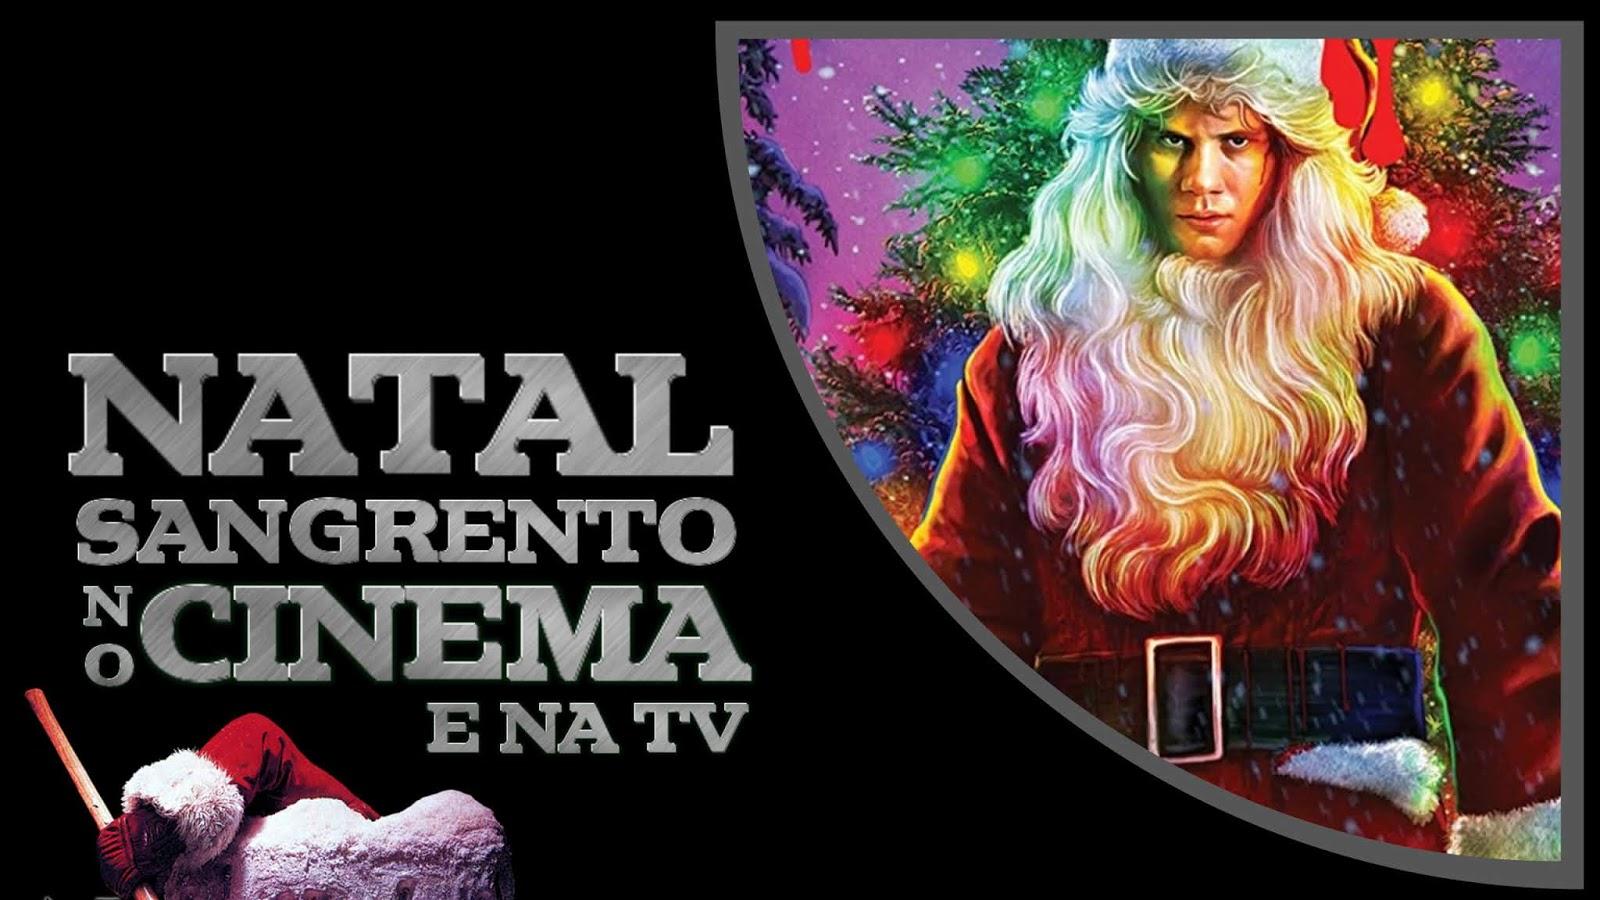 natal-sangrento-no-cinema-tv.